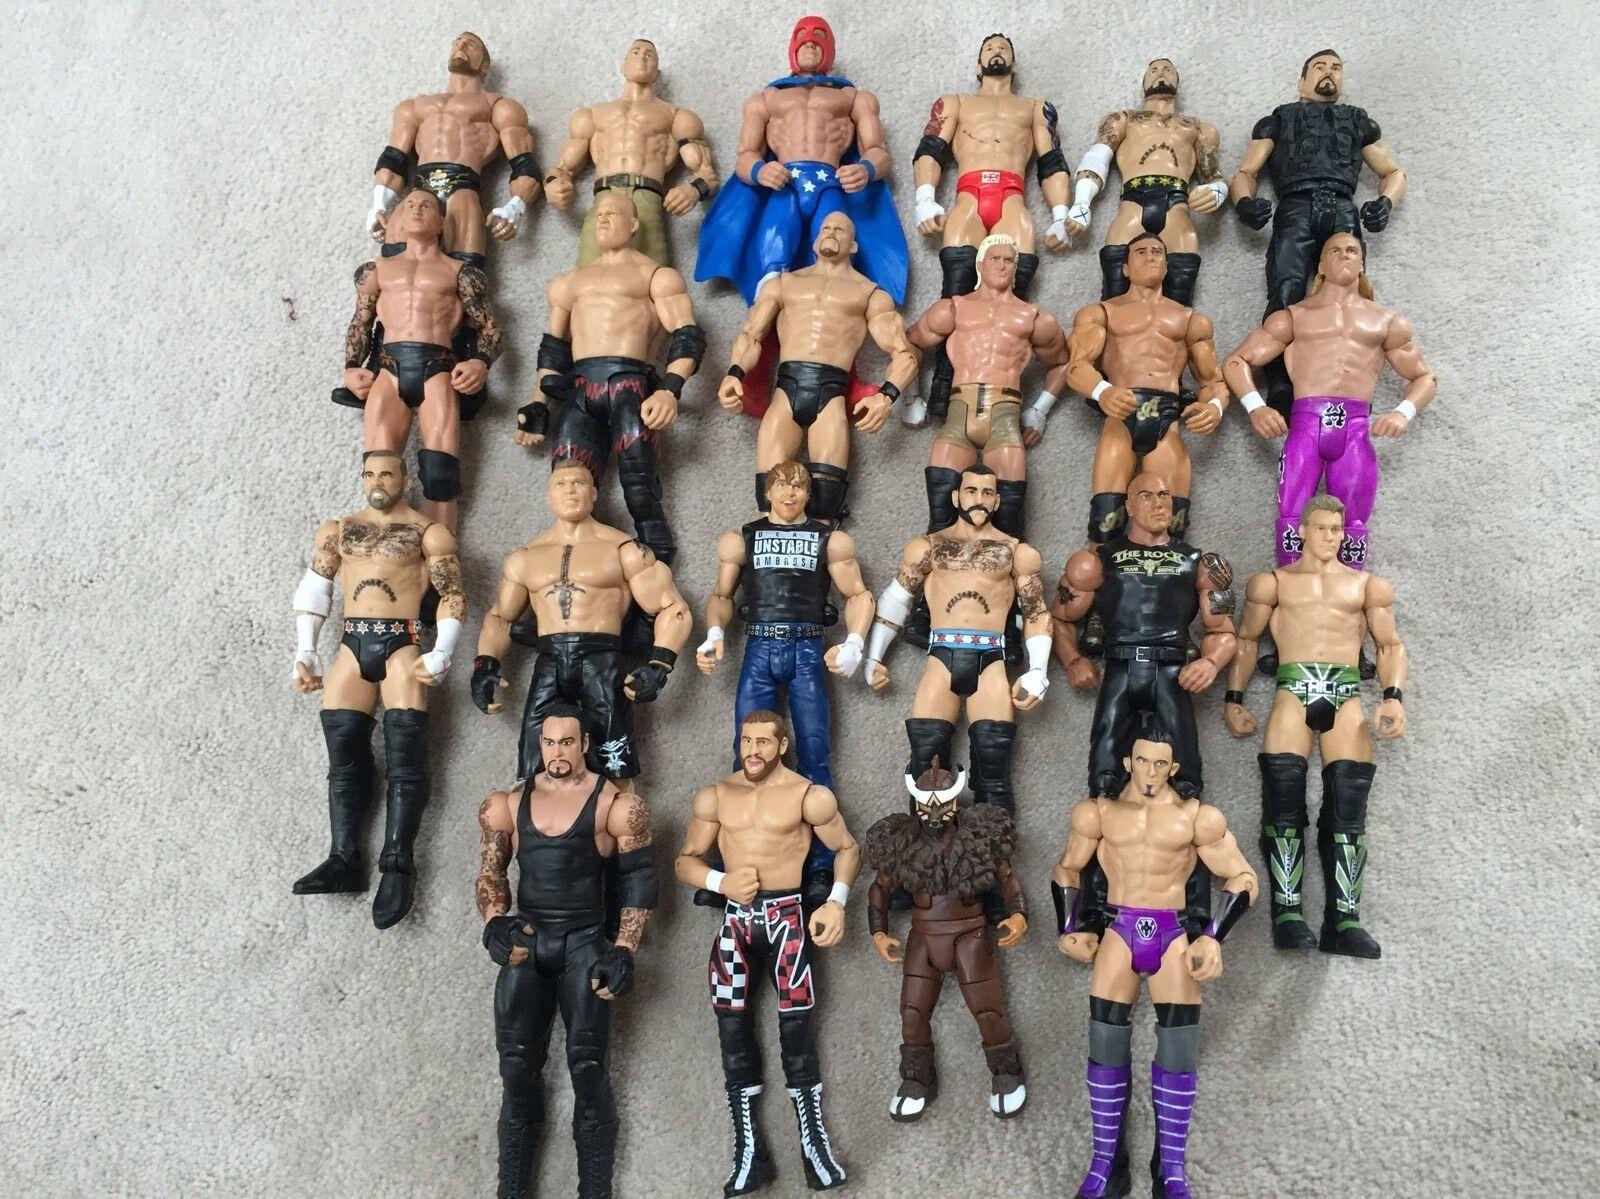 Venta barata WWE Mattel Lote 7 7 7 de 22 figuras de lucha, Elite, Flashback, básico, WCW, ECW  venta caliente en línea